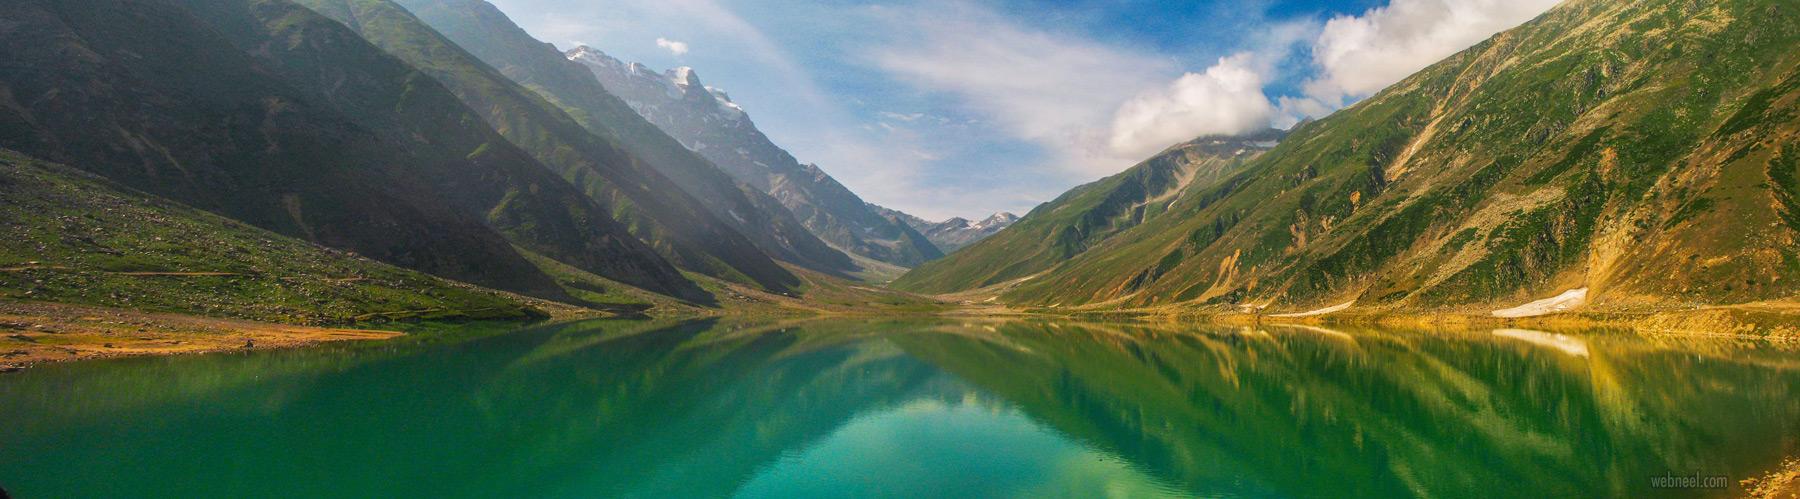 panoramic photography lake mountain